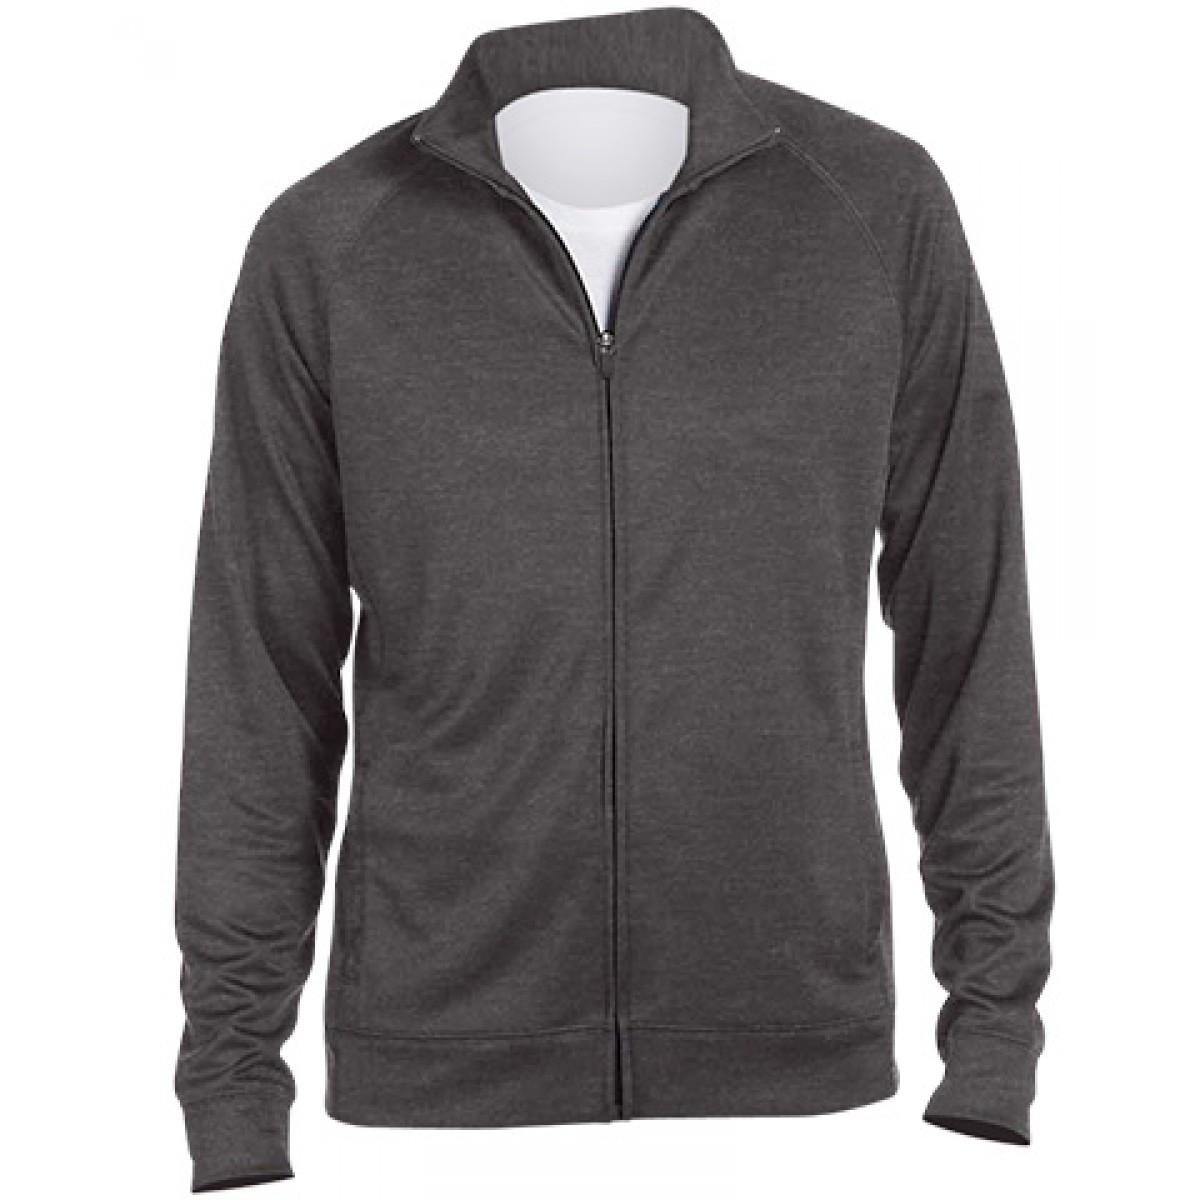 Men's Lightweight Sports Jacket-Sports Grey-XL